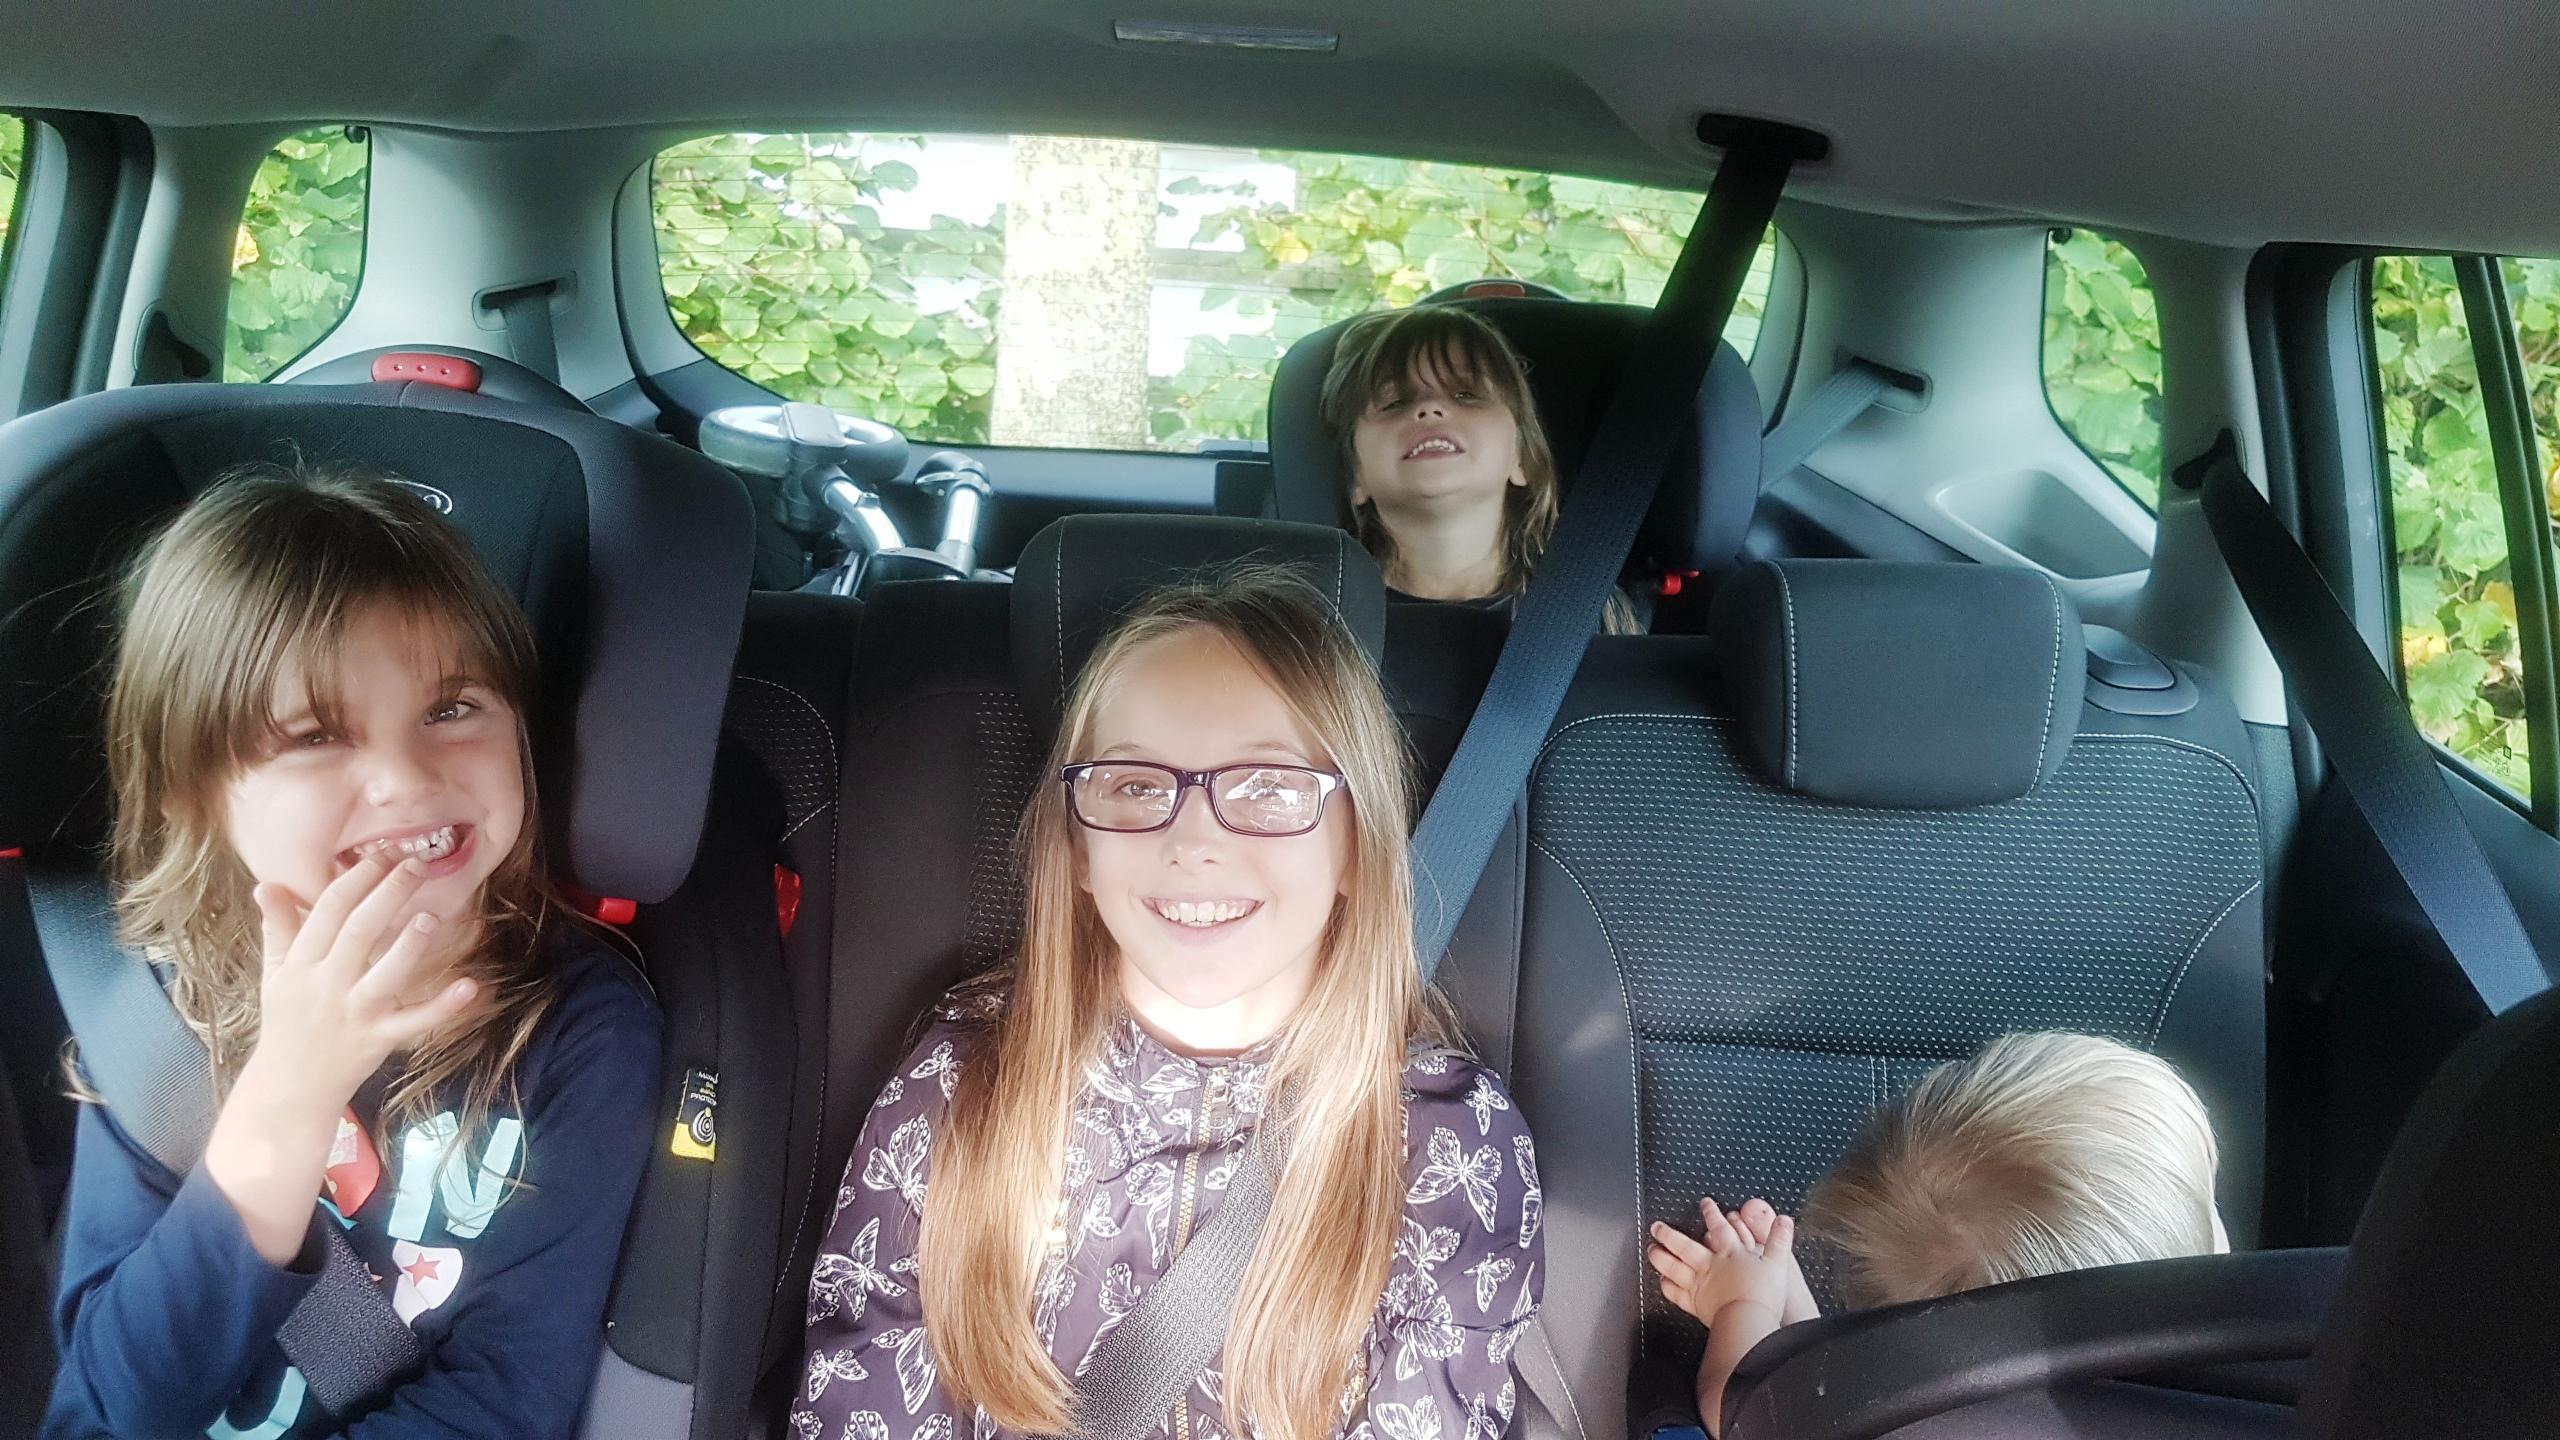 Vauxhall Zafira Review, 2016 Vauxhall Zafira, Zafira, Vauxhall, Zafira Tourer, Family car review, seven seater